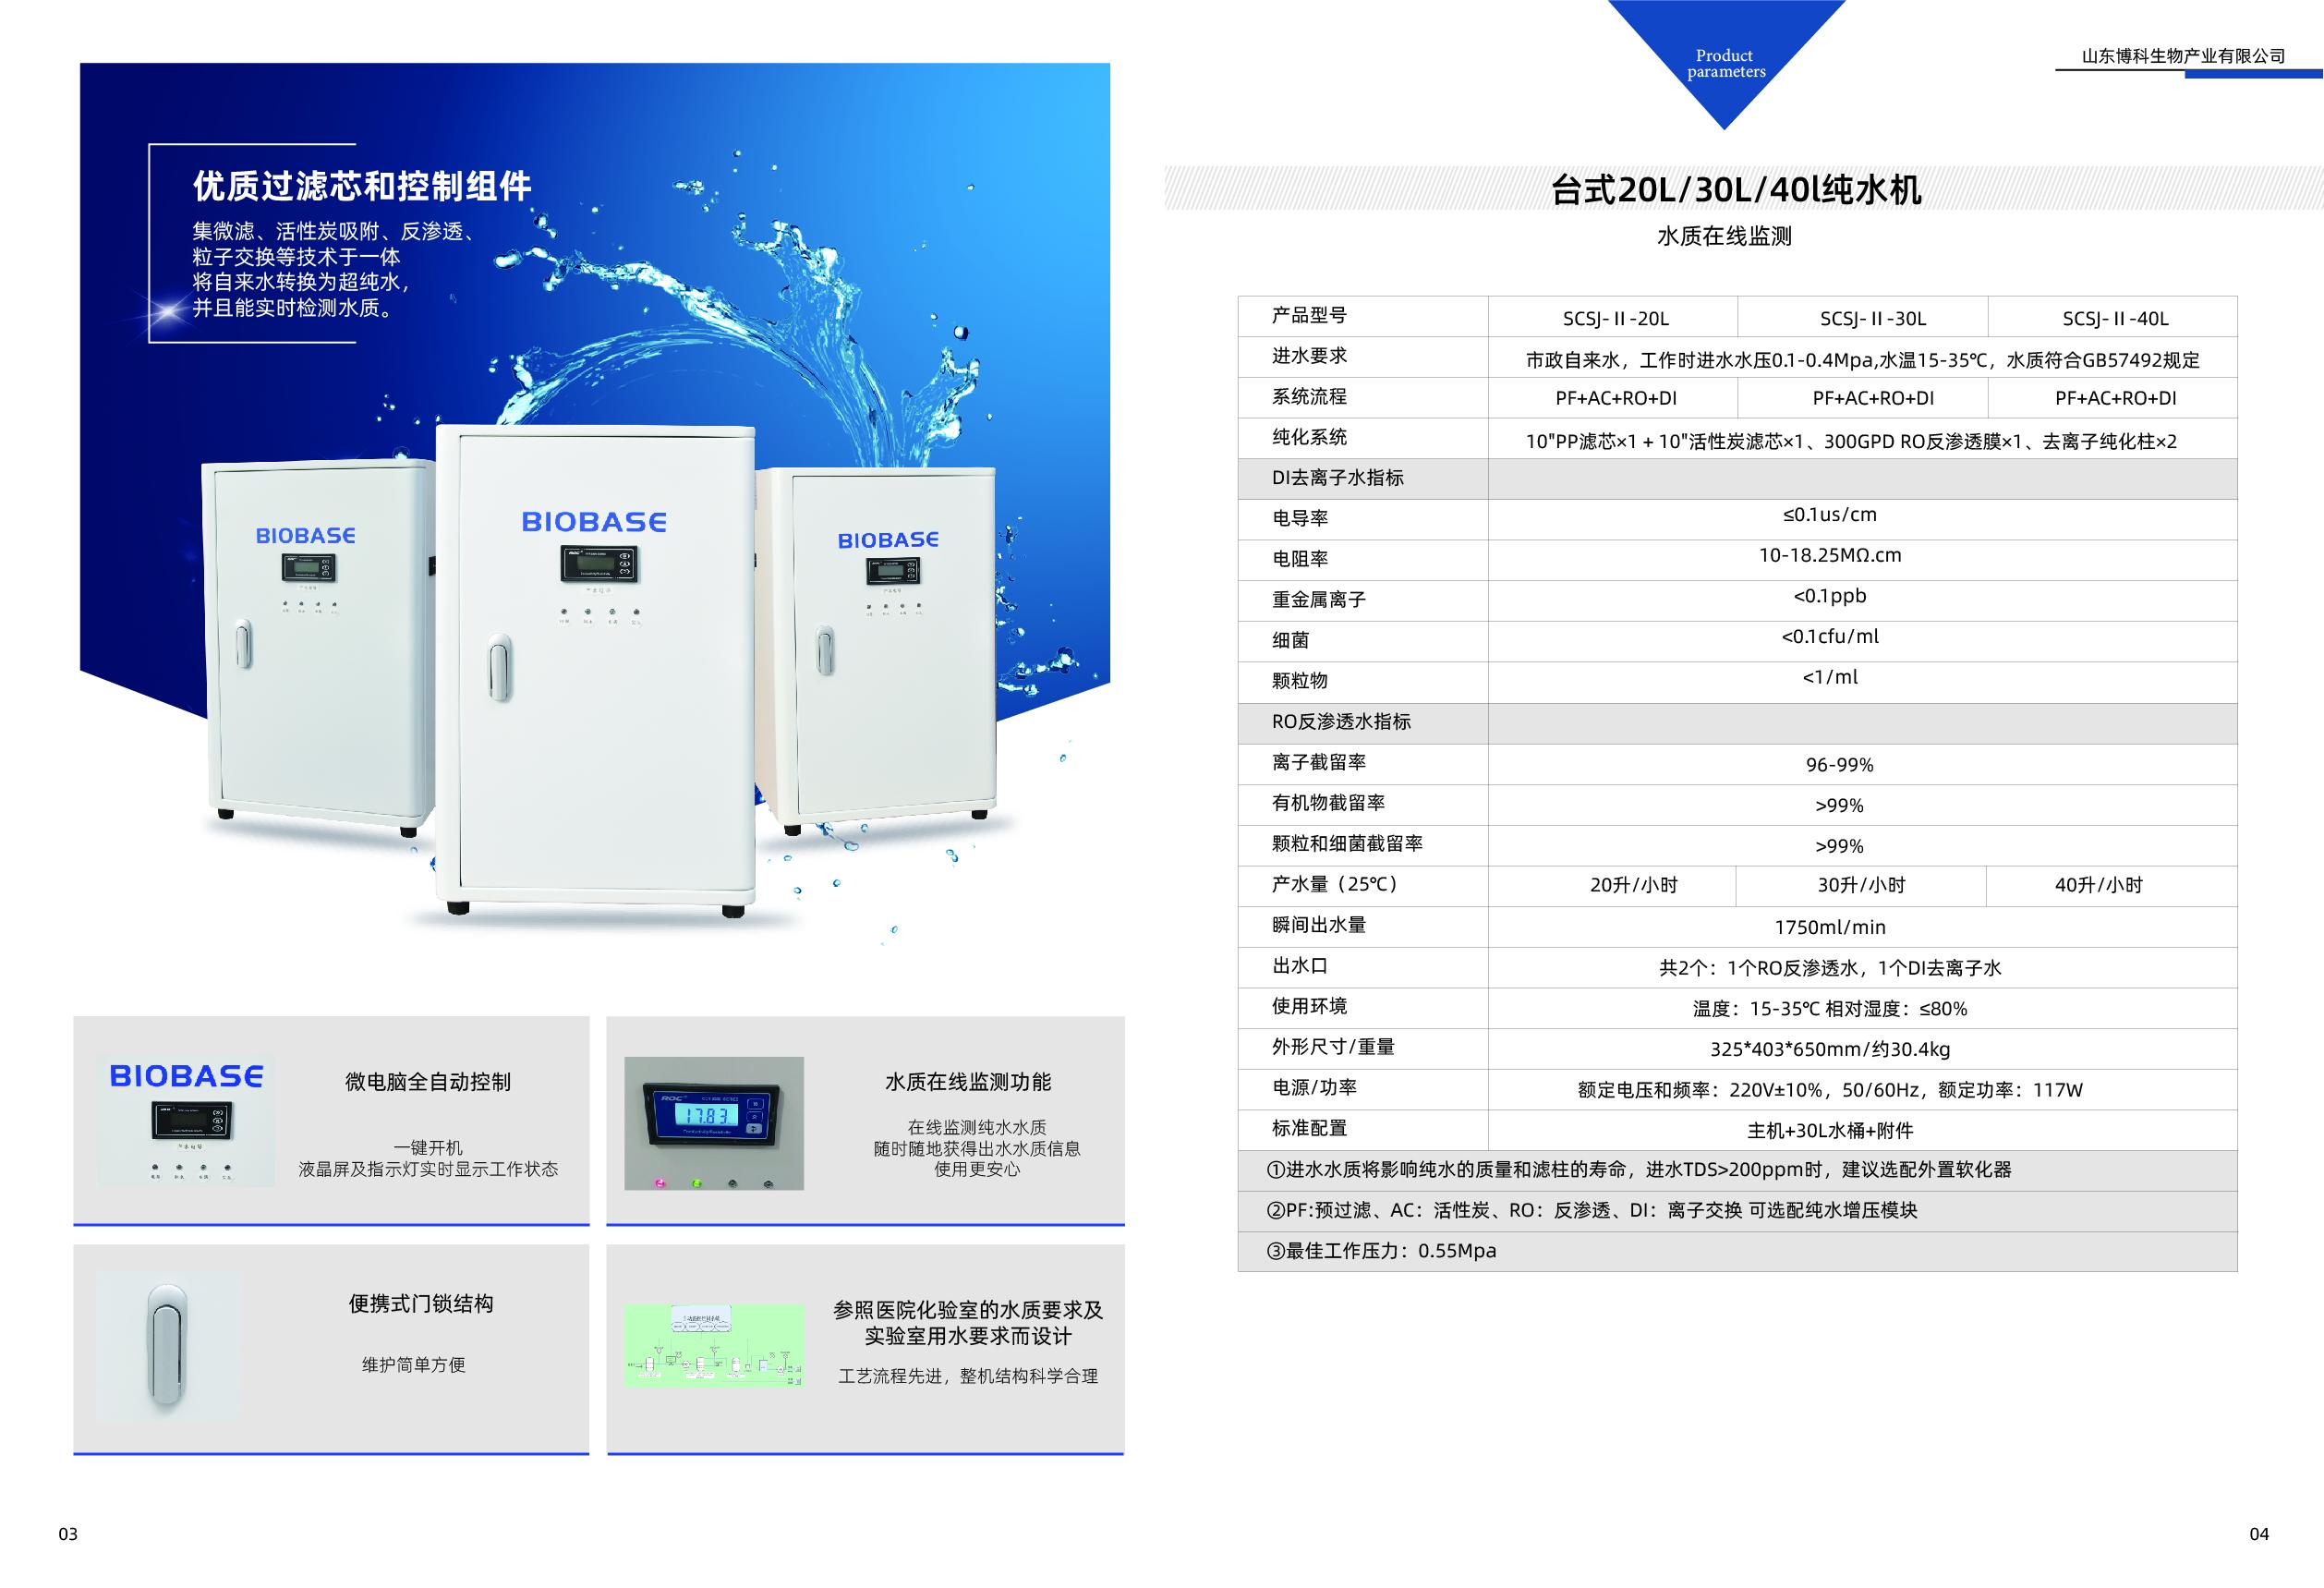 SCSJ-II-30L纯水机 价格便宜 博科实验室纯水机 *示例图2